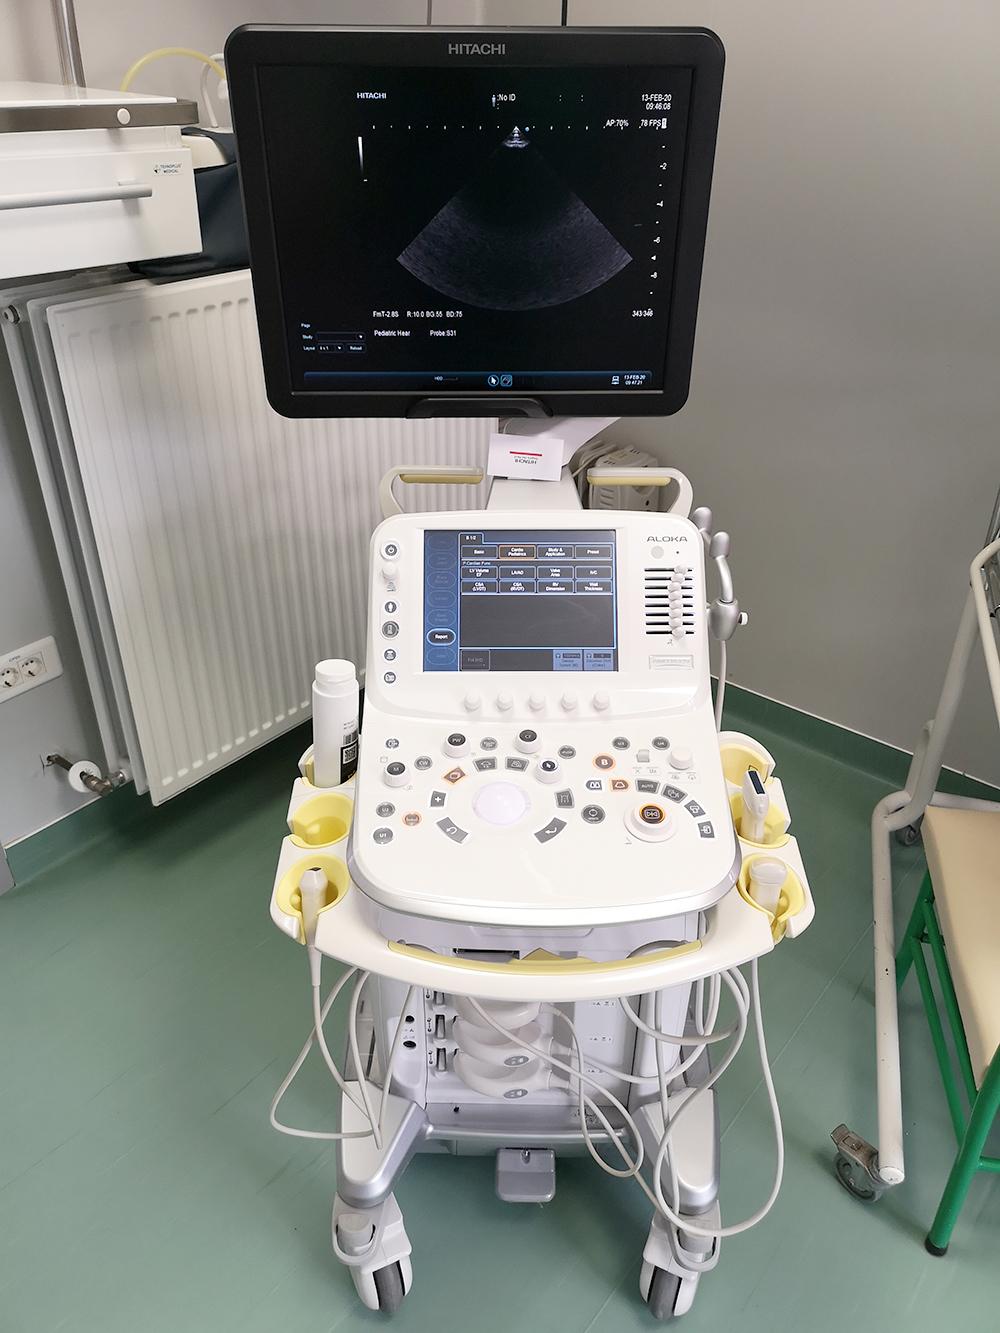 Ecograf de inalta performanta pentru nou nascuti ARIETTA V70 HITACHI